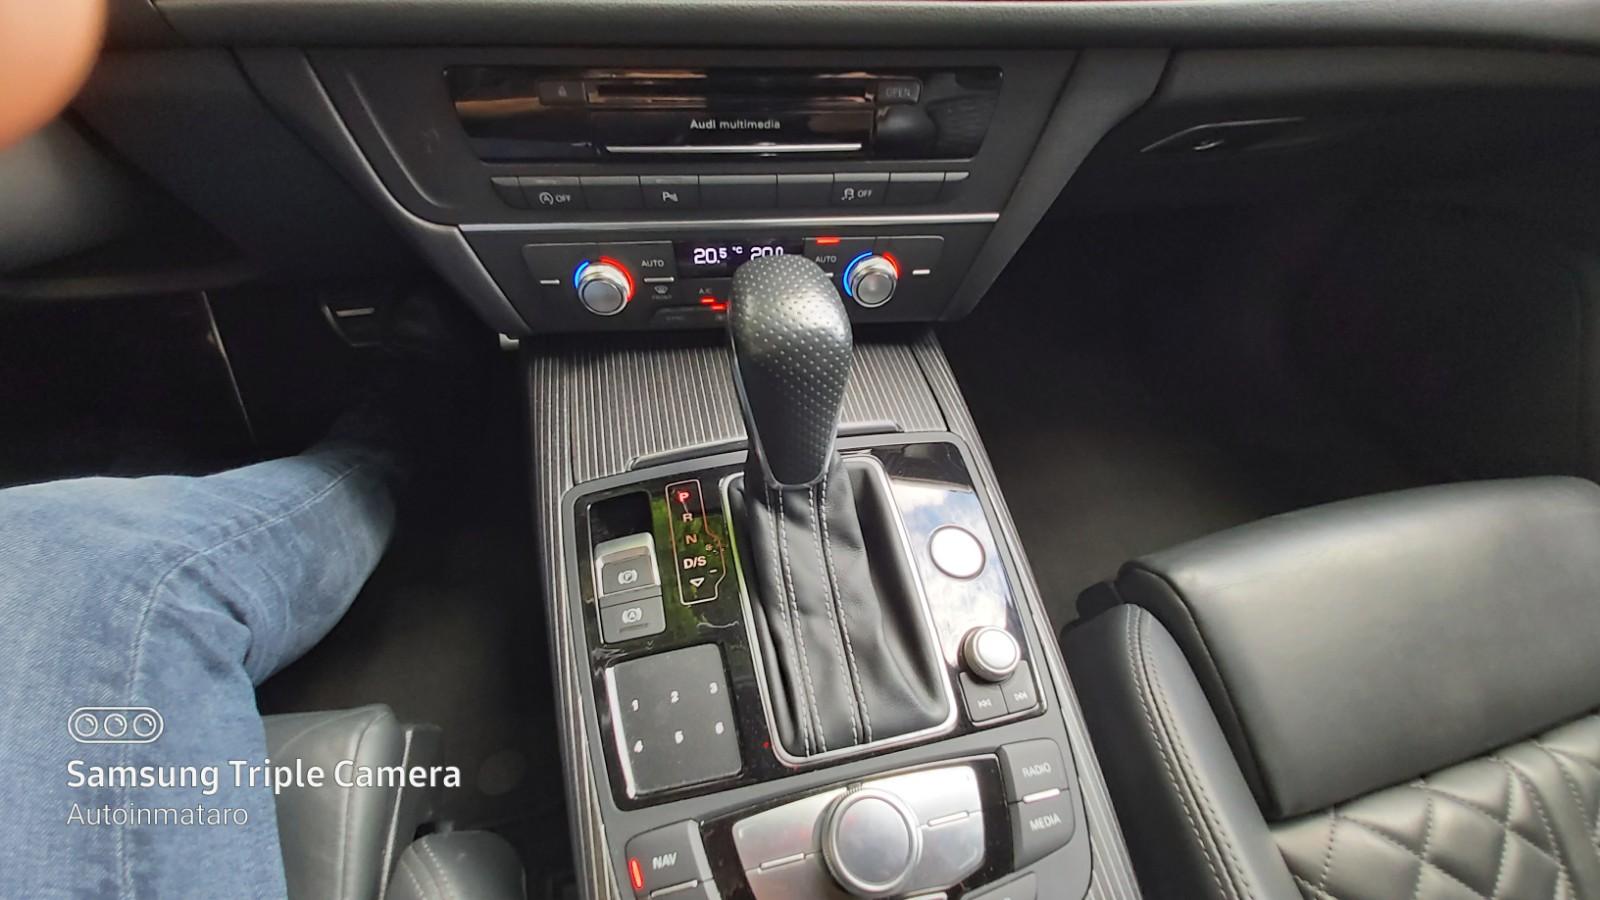 AUDI A6 Competition 3.0 TDI 240kW quattro tiptronic Avant